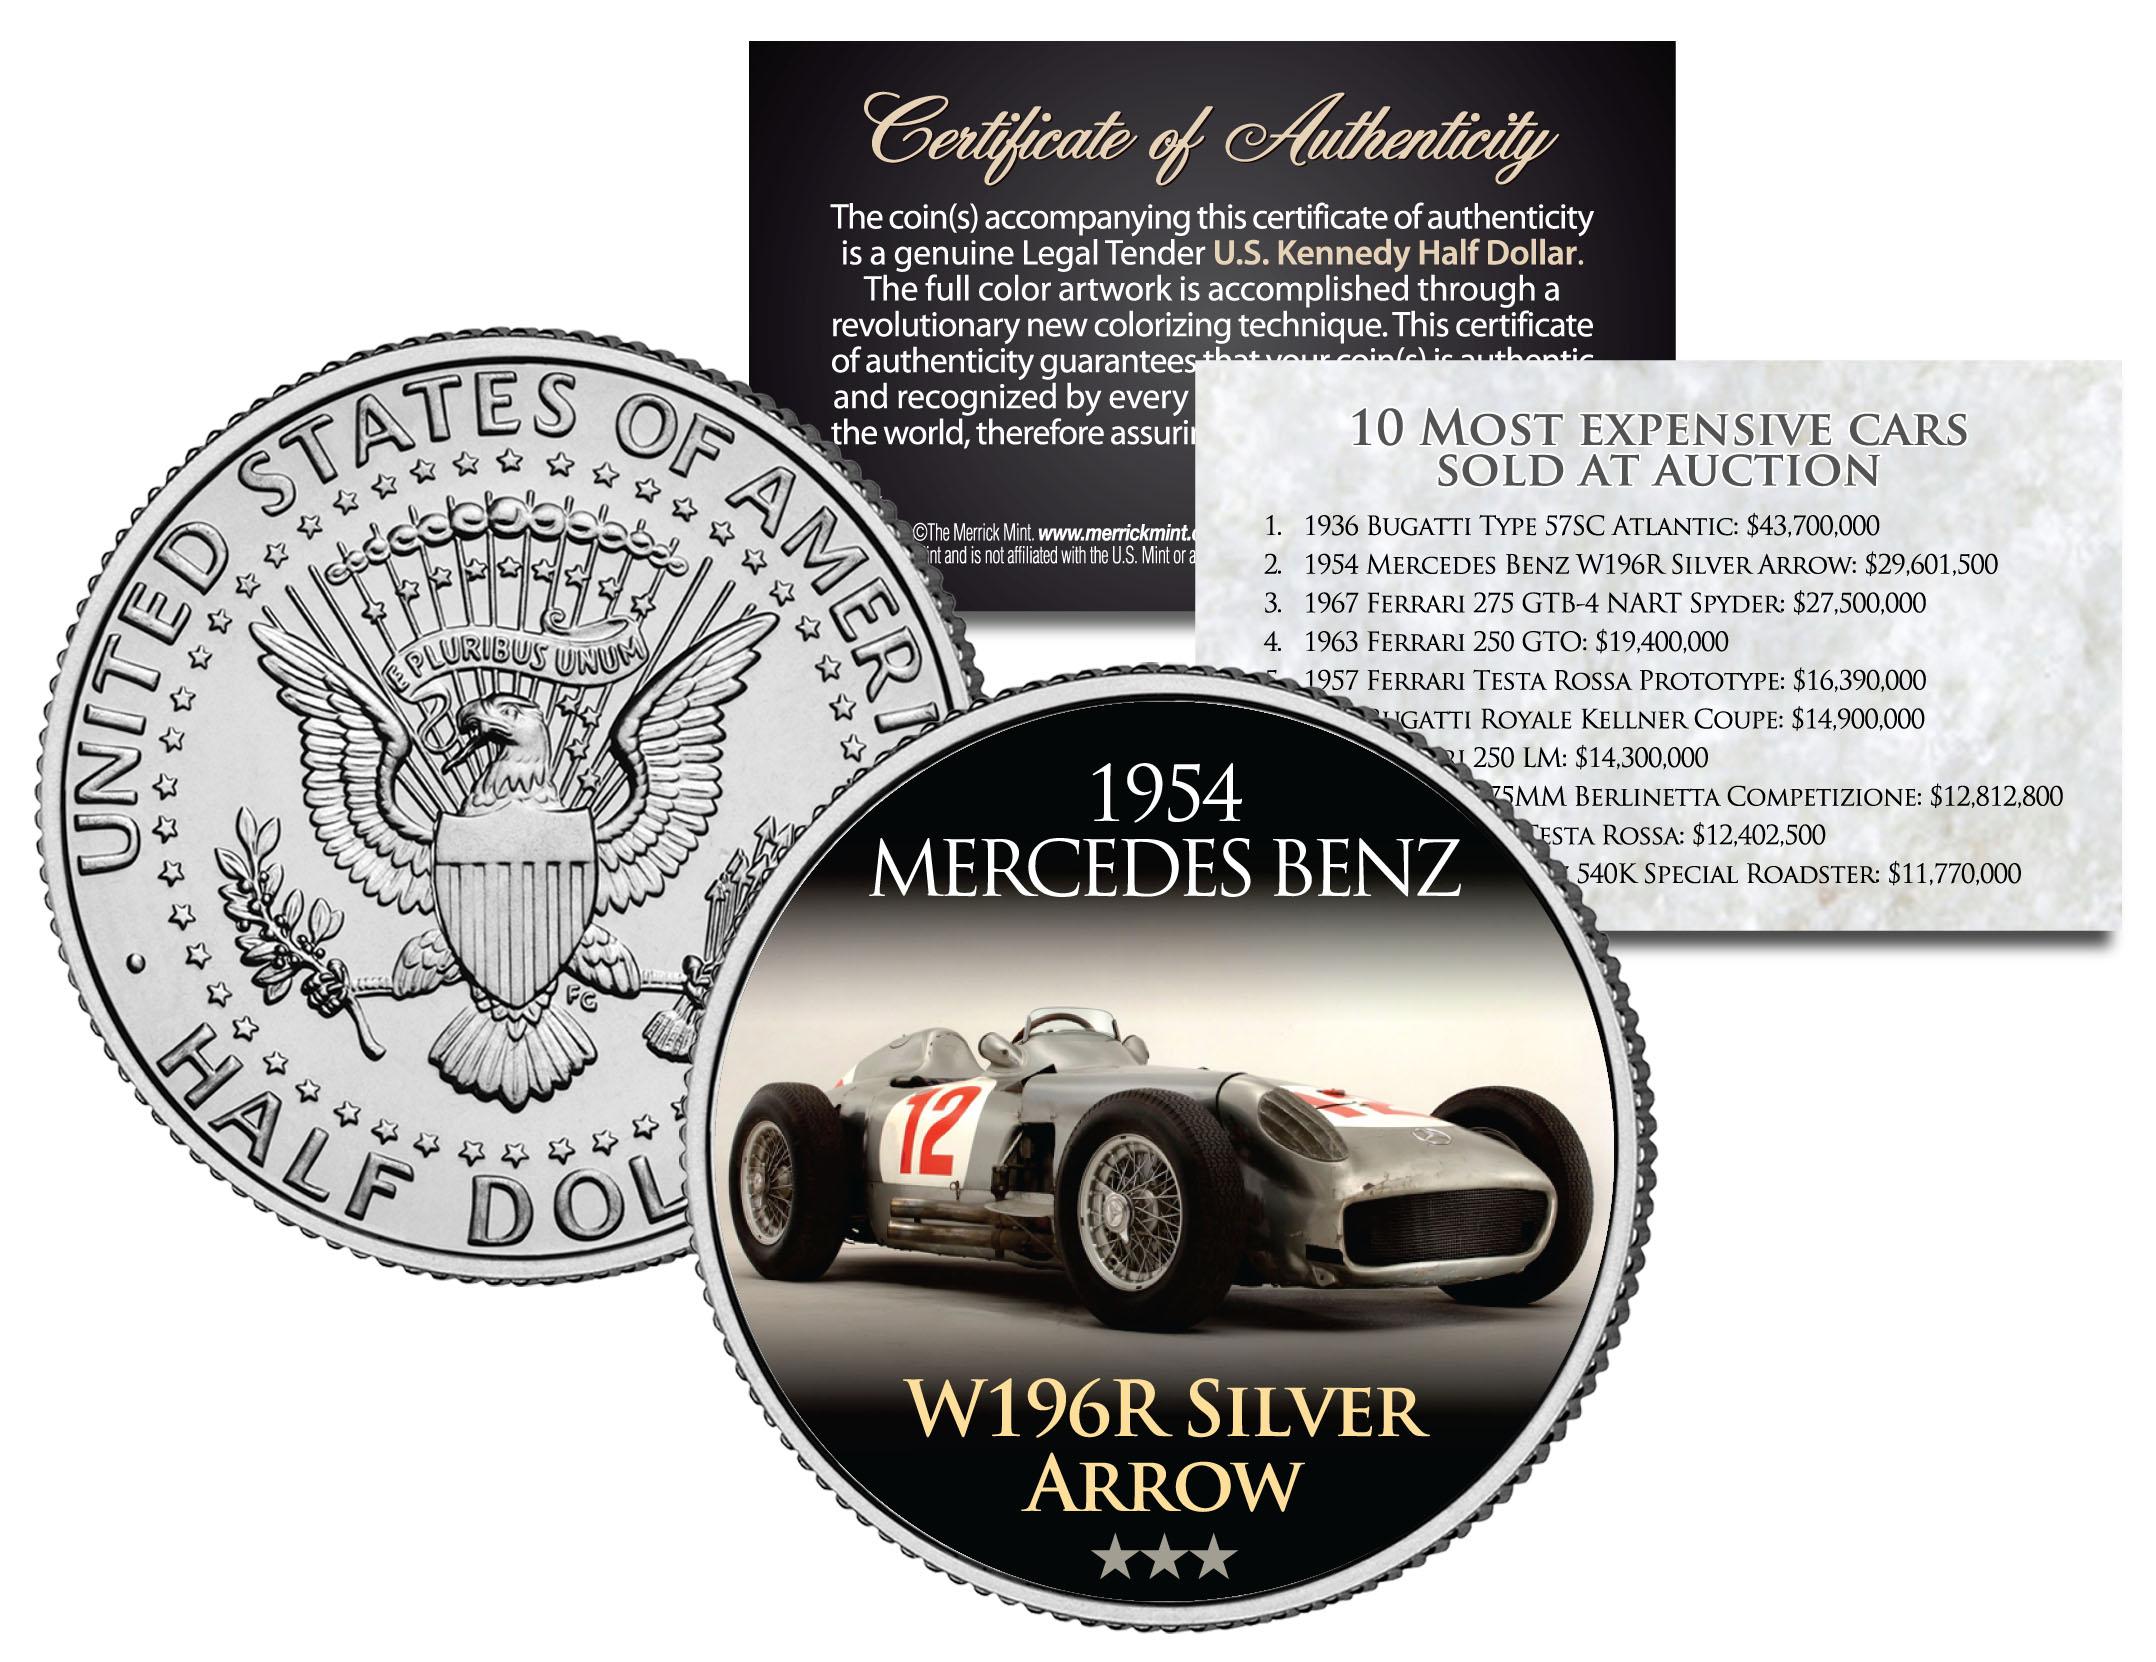 W196R Silver Arrow